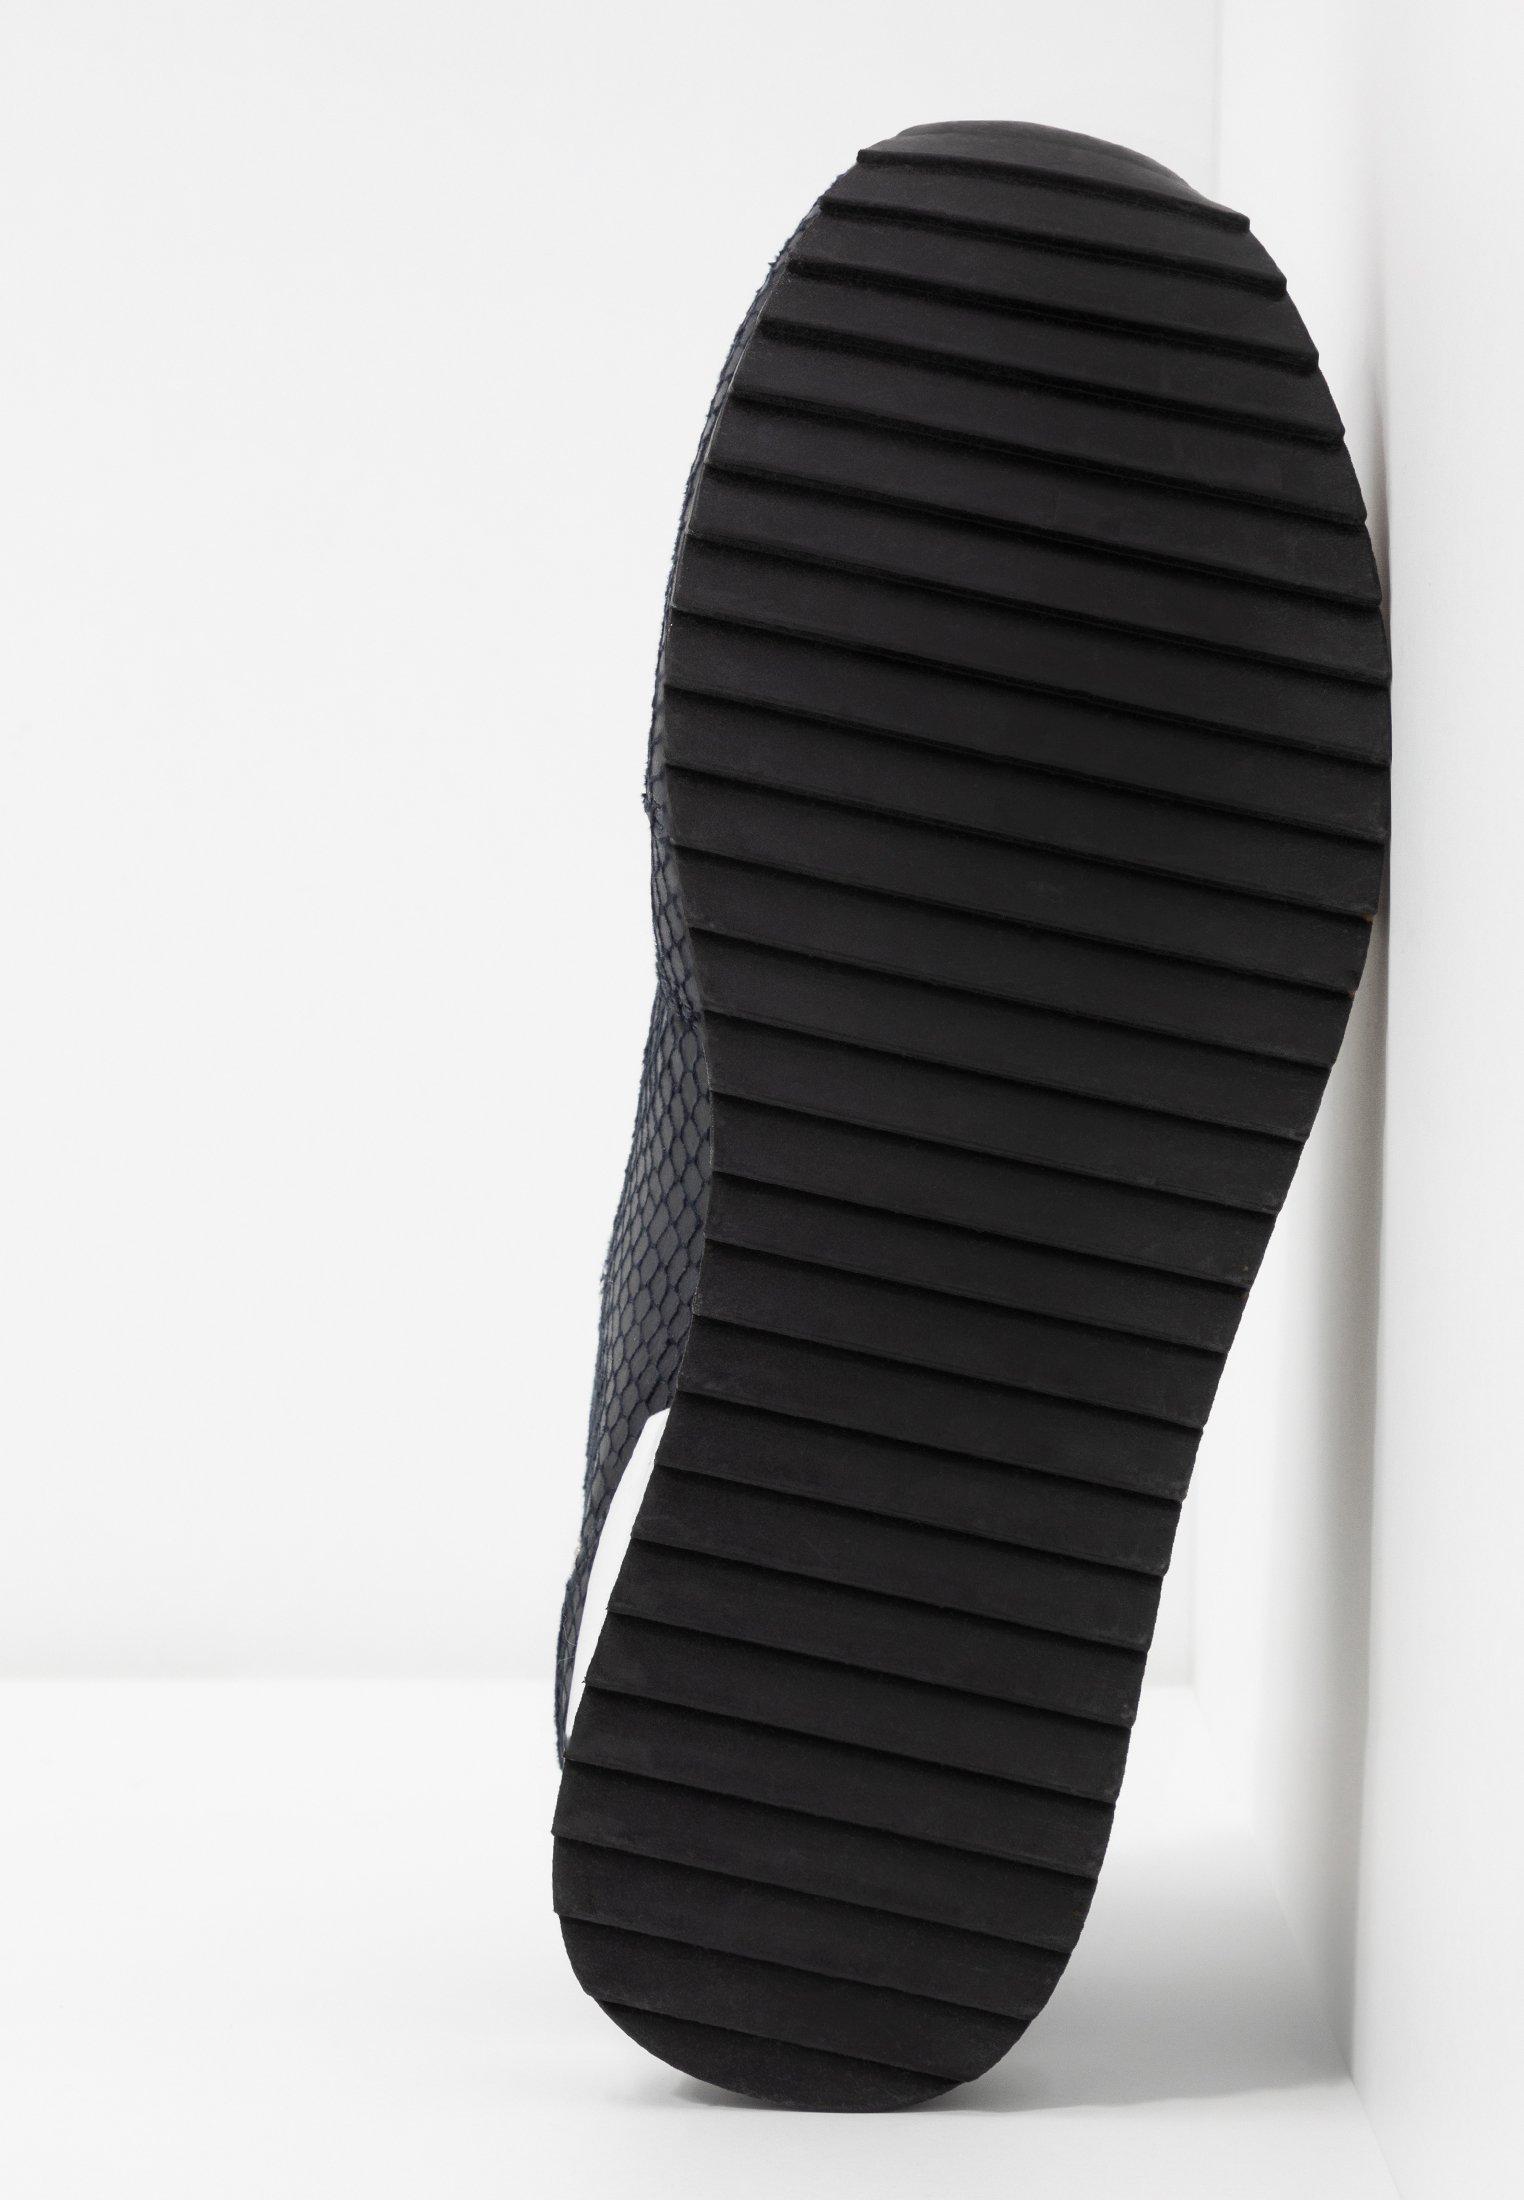 Black Replay Basse Replay SheridanSneakers Black Replay Basse SheridanSneakers R4q3AL5j